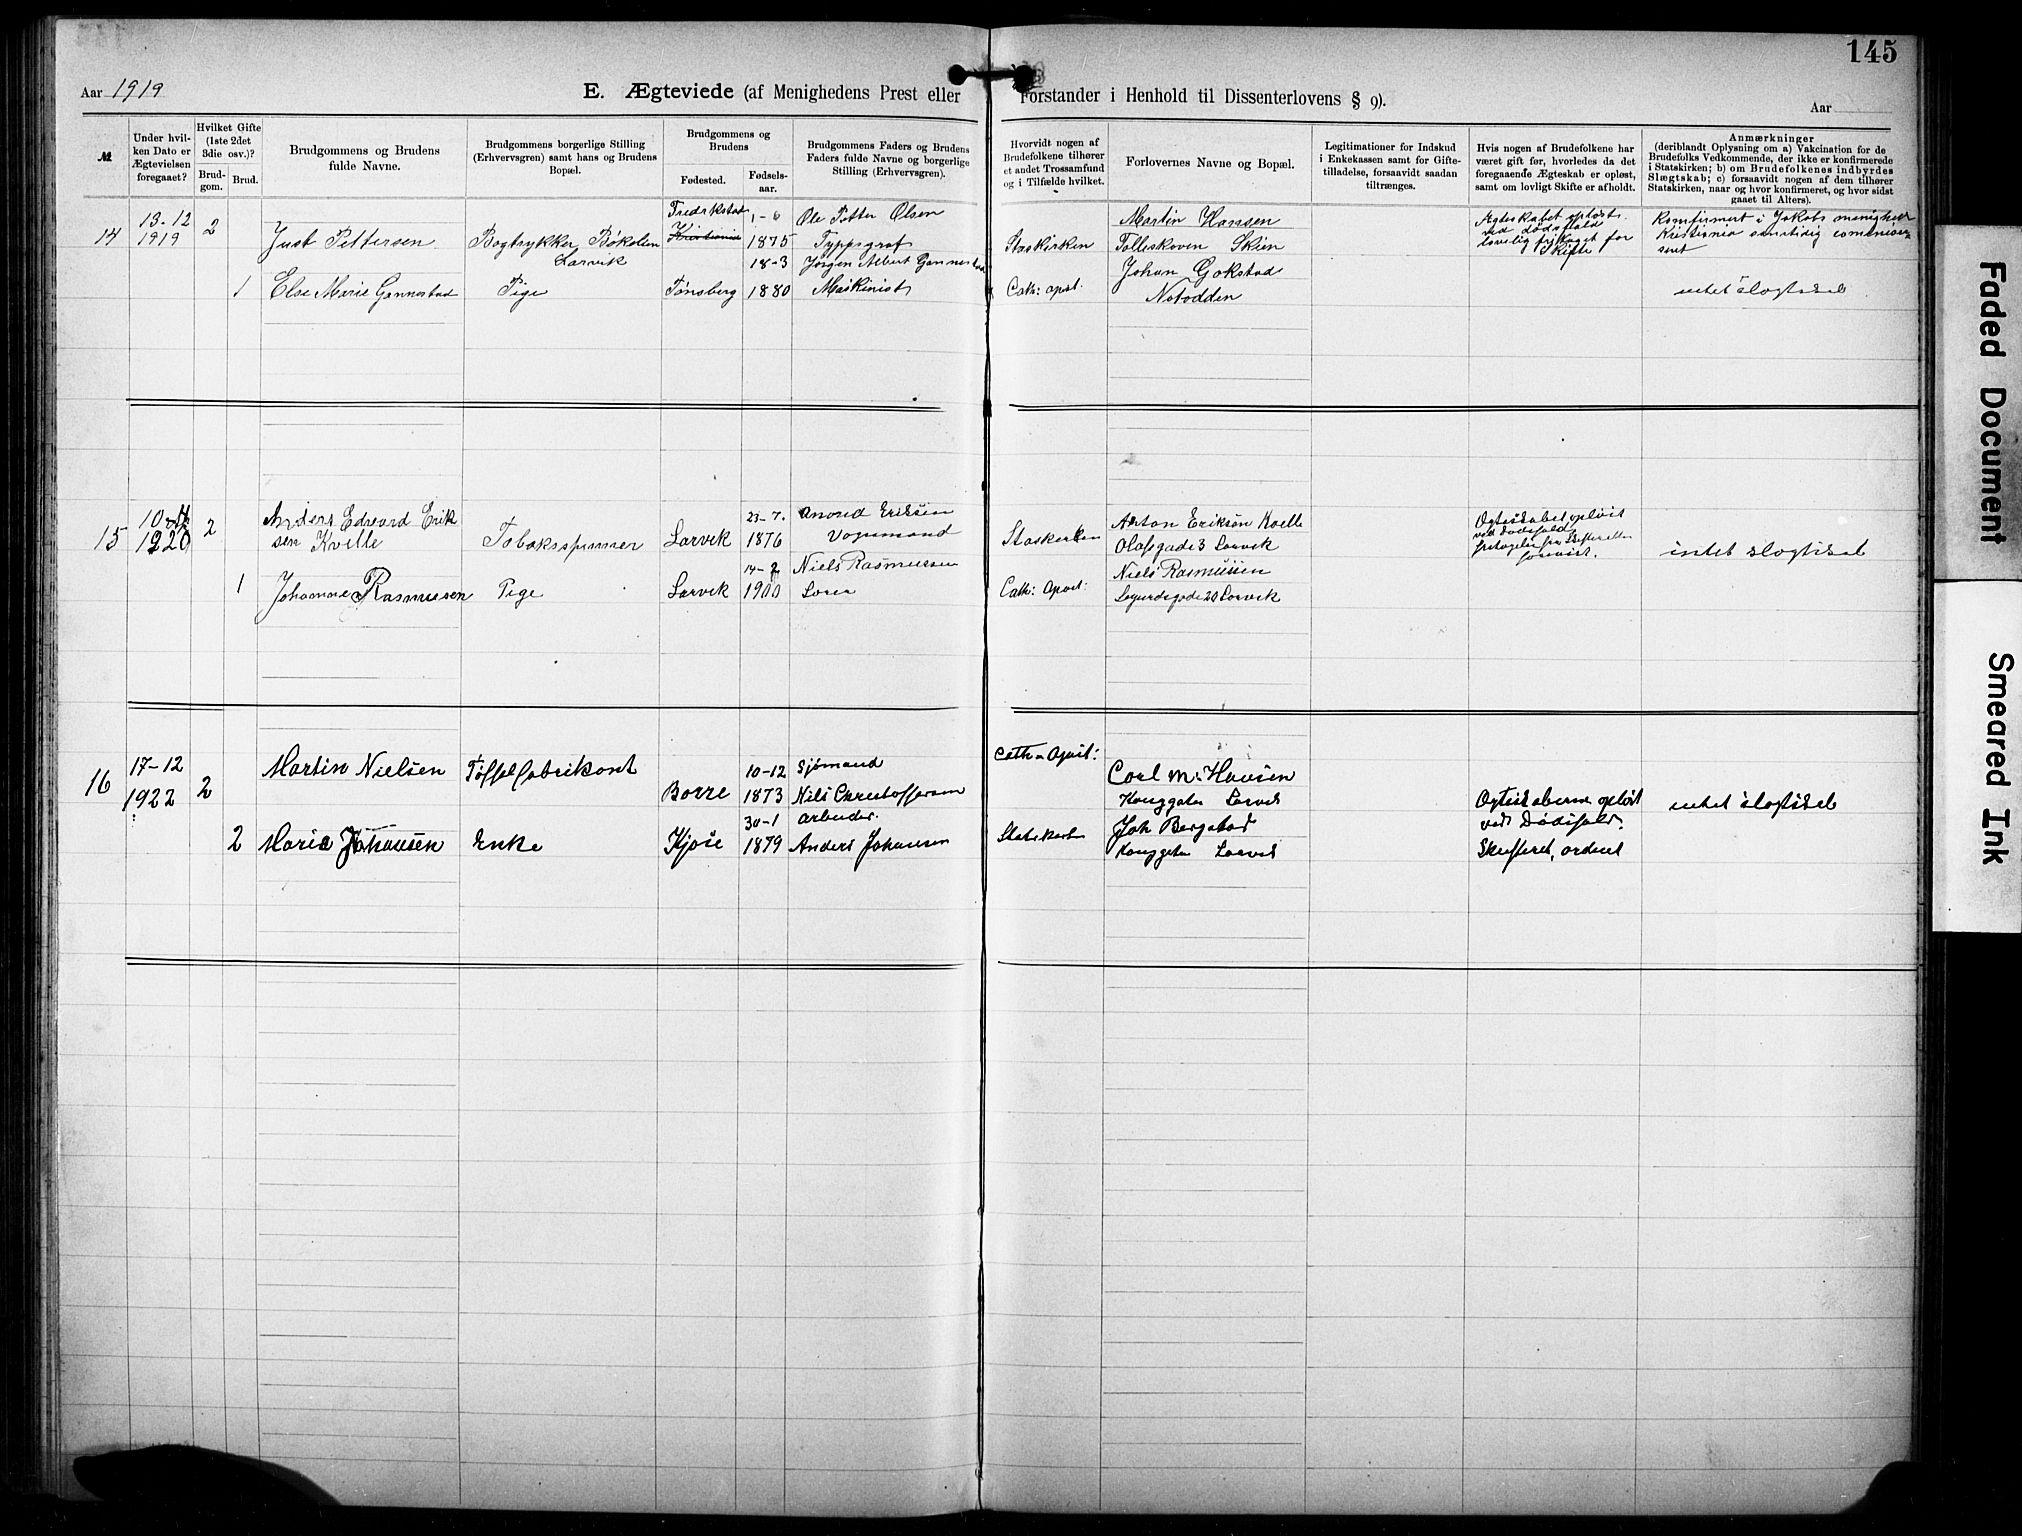 SAKO, Den katolsk-apostoliske menighet i Larvik, F/Fa/L0001: Dissenterprotokoll nr. 1, 1892-1933, s. 145